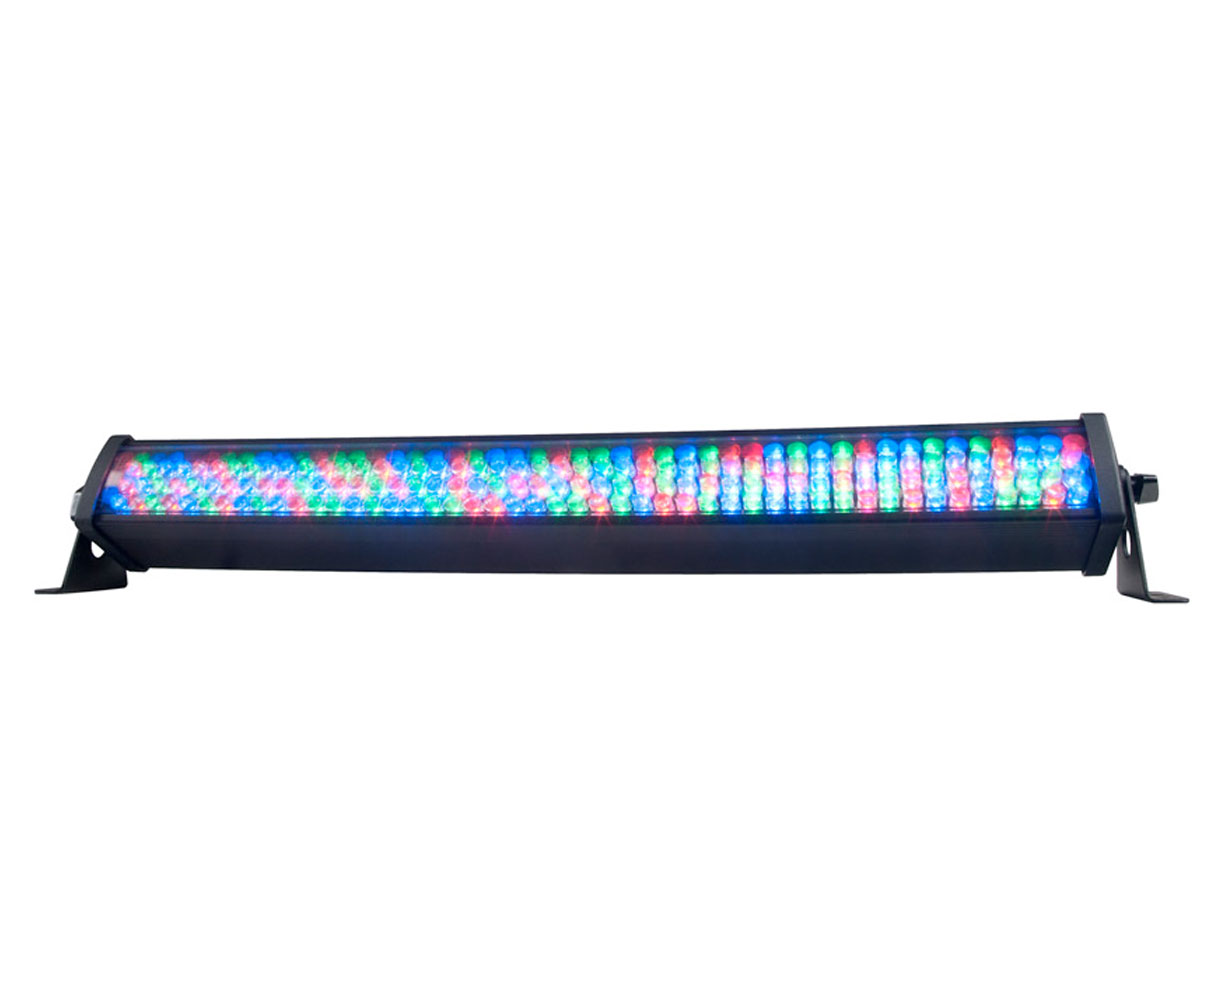 american dj mega go bar 50 rgba rechargeable battery powered led lighting bar ebay. Black Bedroom Furniture Sets. Home Design Ideas